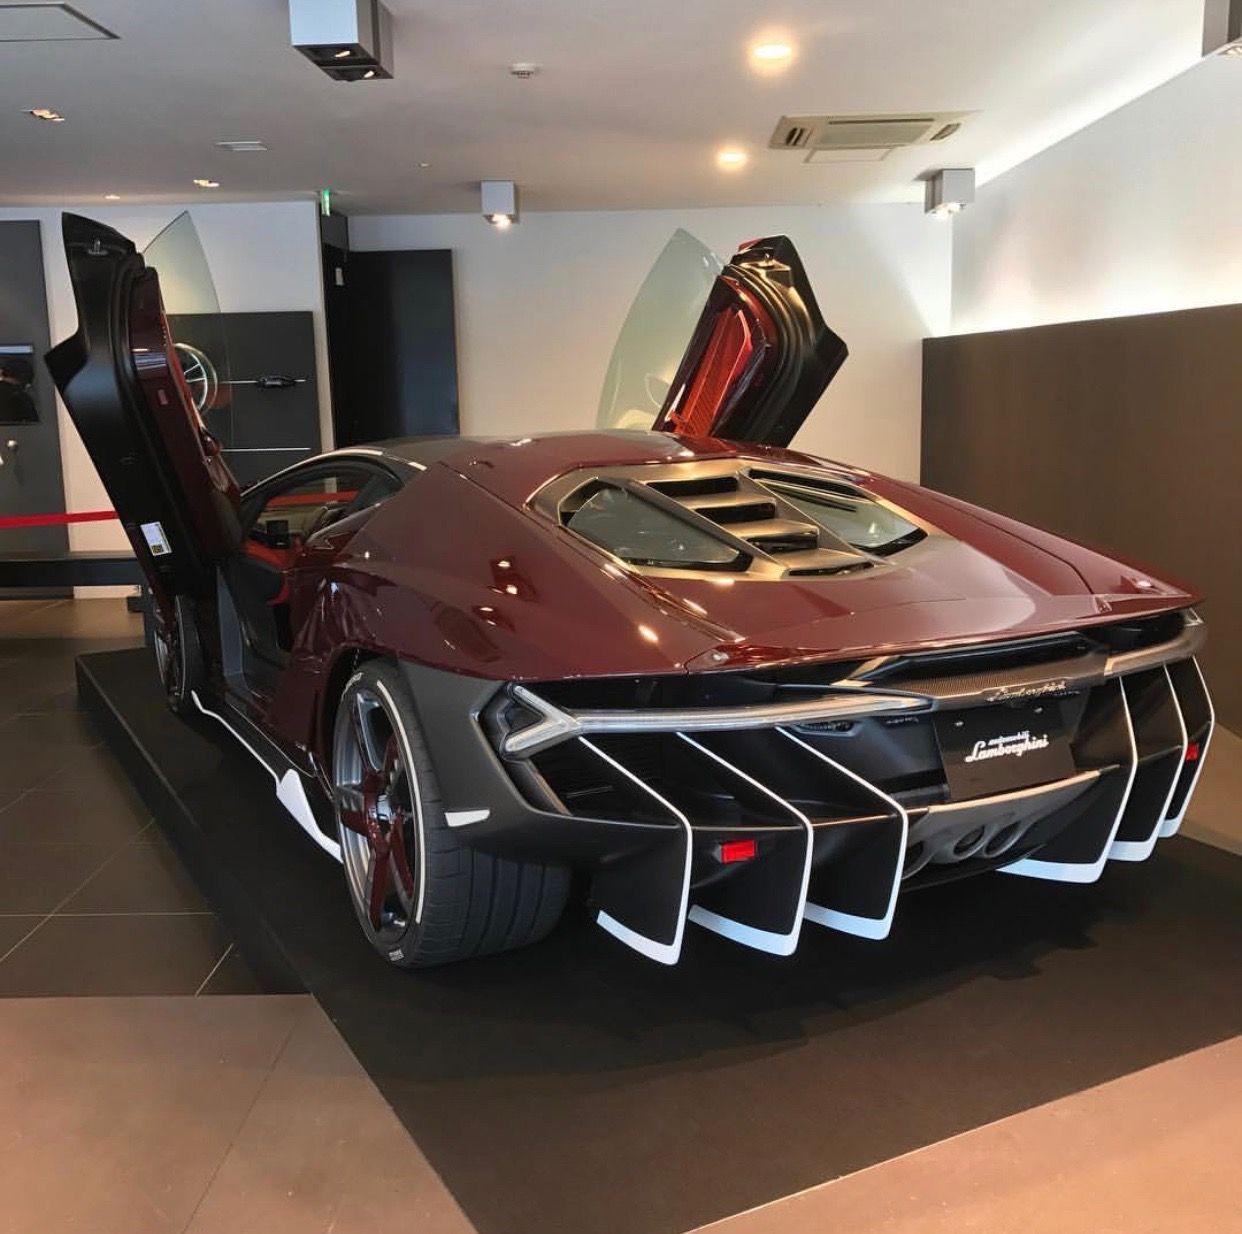 The Pagani Huayra Super Cars Luxury Cars Amazing Cars